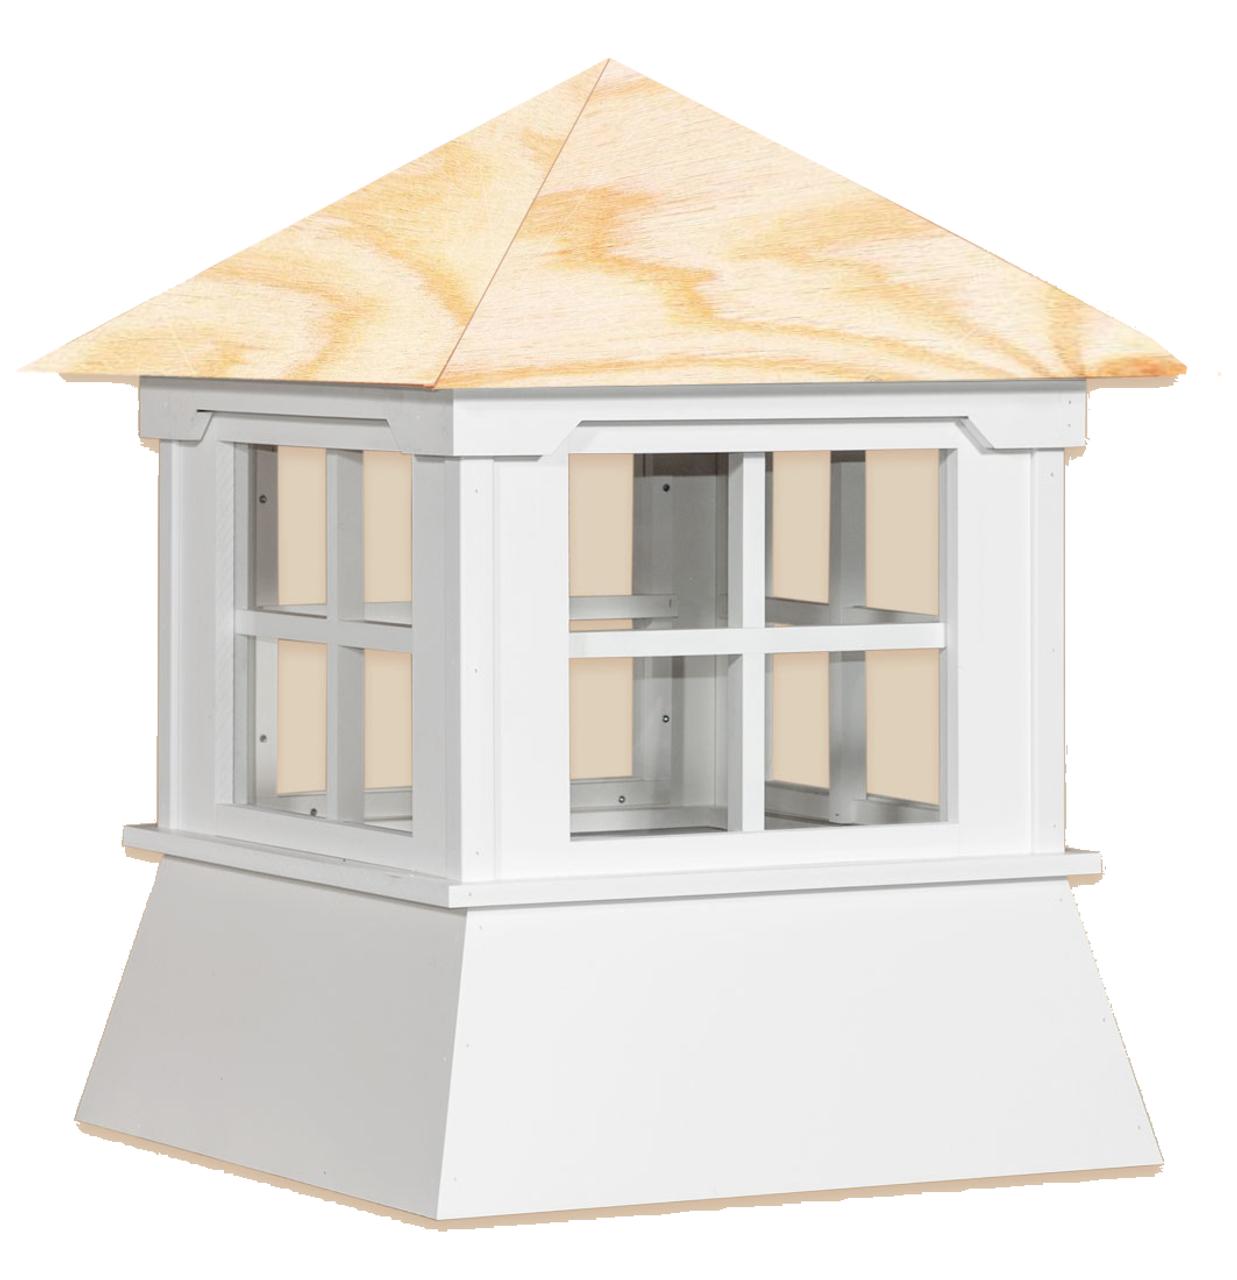 Cupola - Manor Shed: Azek – Windowed Wood Top - 30Lx30Wx36H